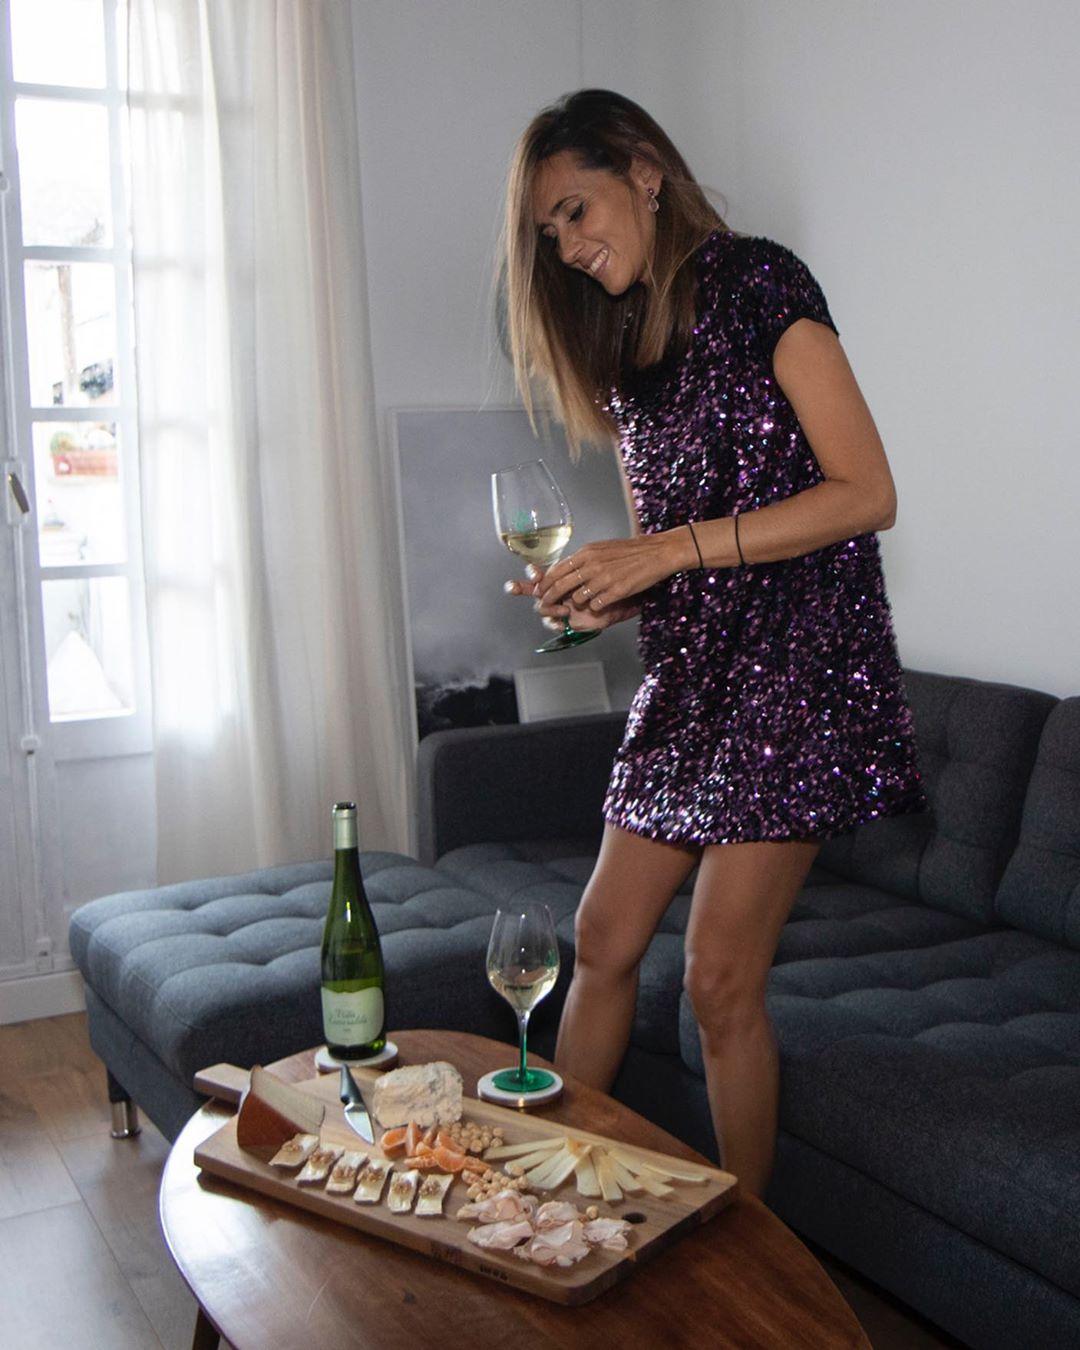 sequined dress de Zara sur coohuco